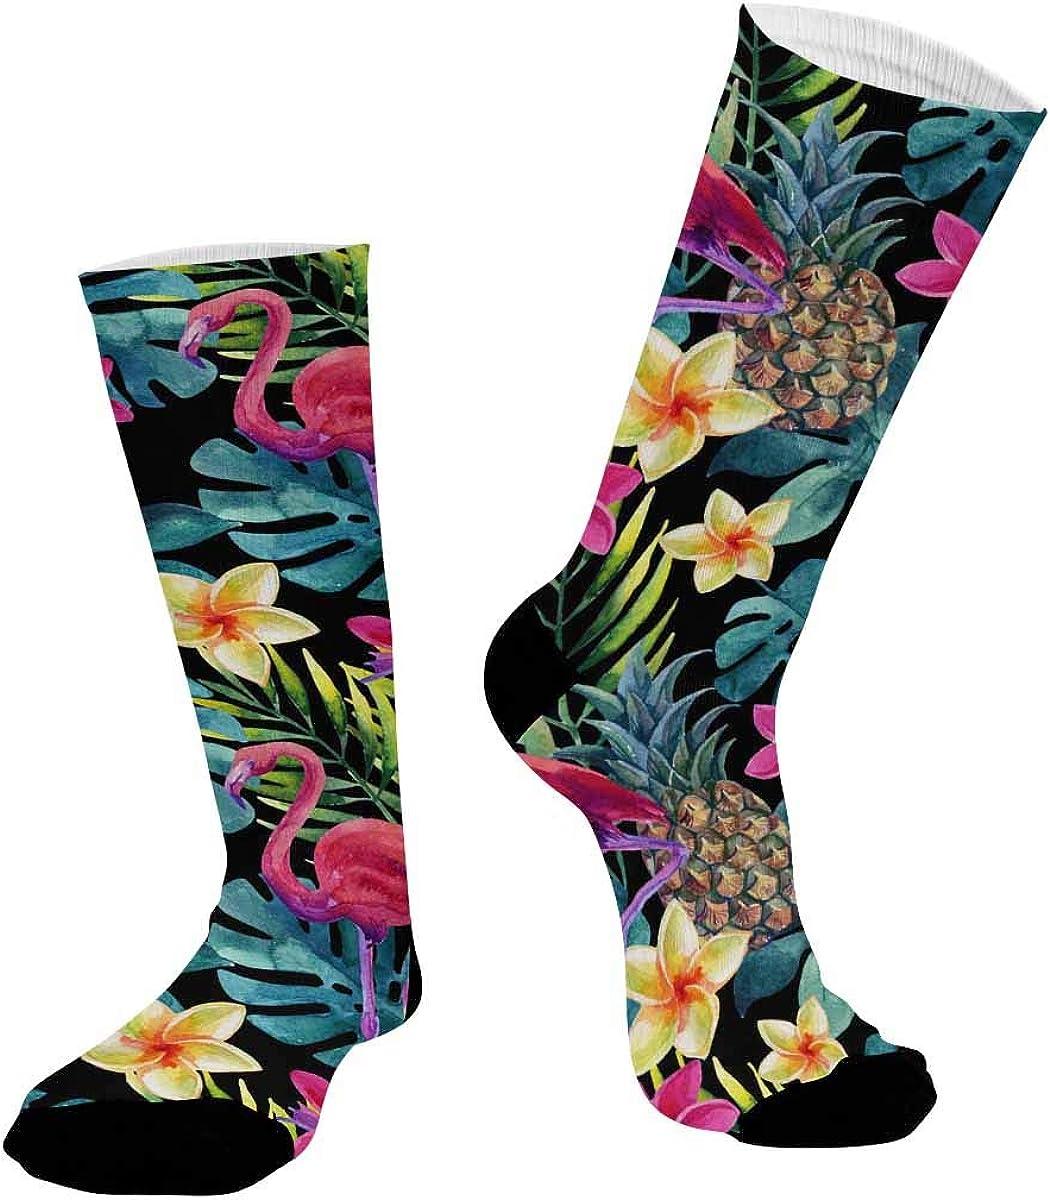 INTERESTPRINT Sublimated Crew Casual Athletic Socks Pineapple, Flamingo, Flowers